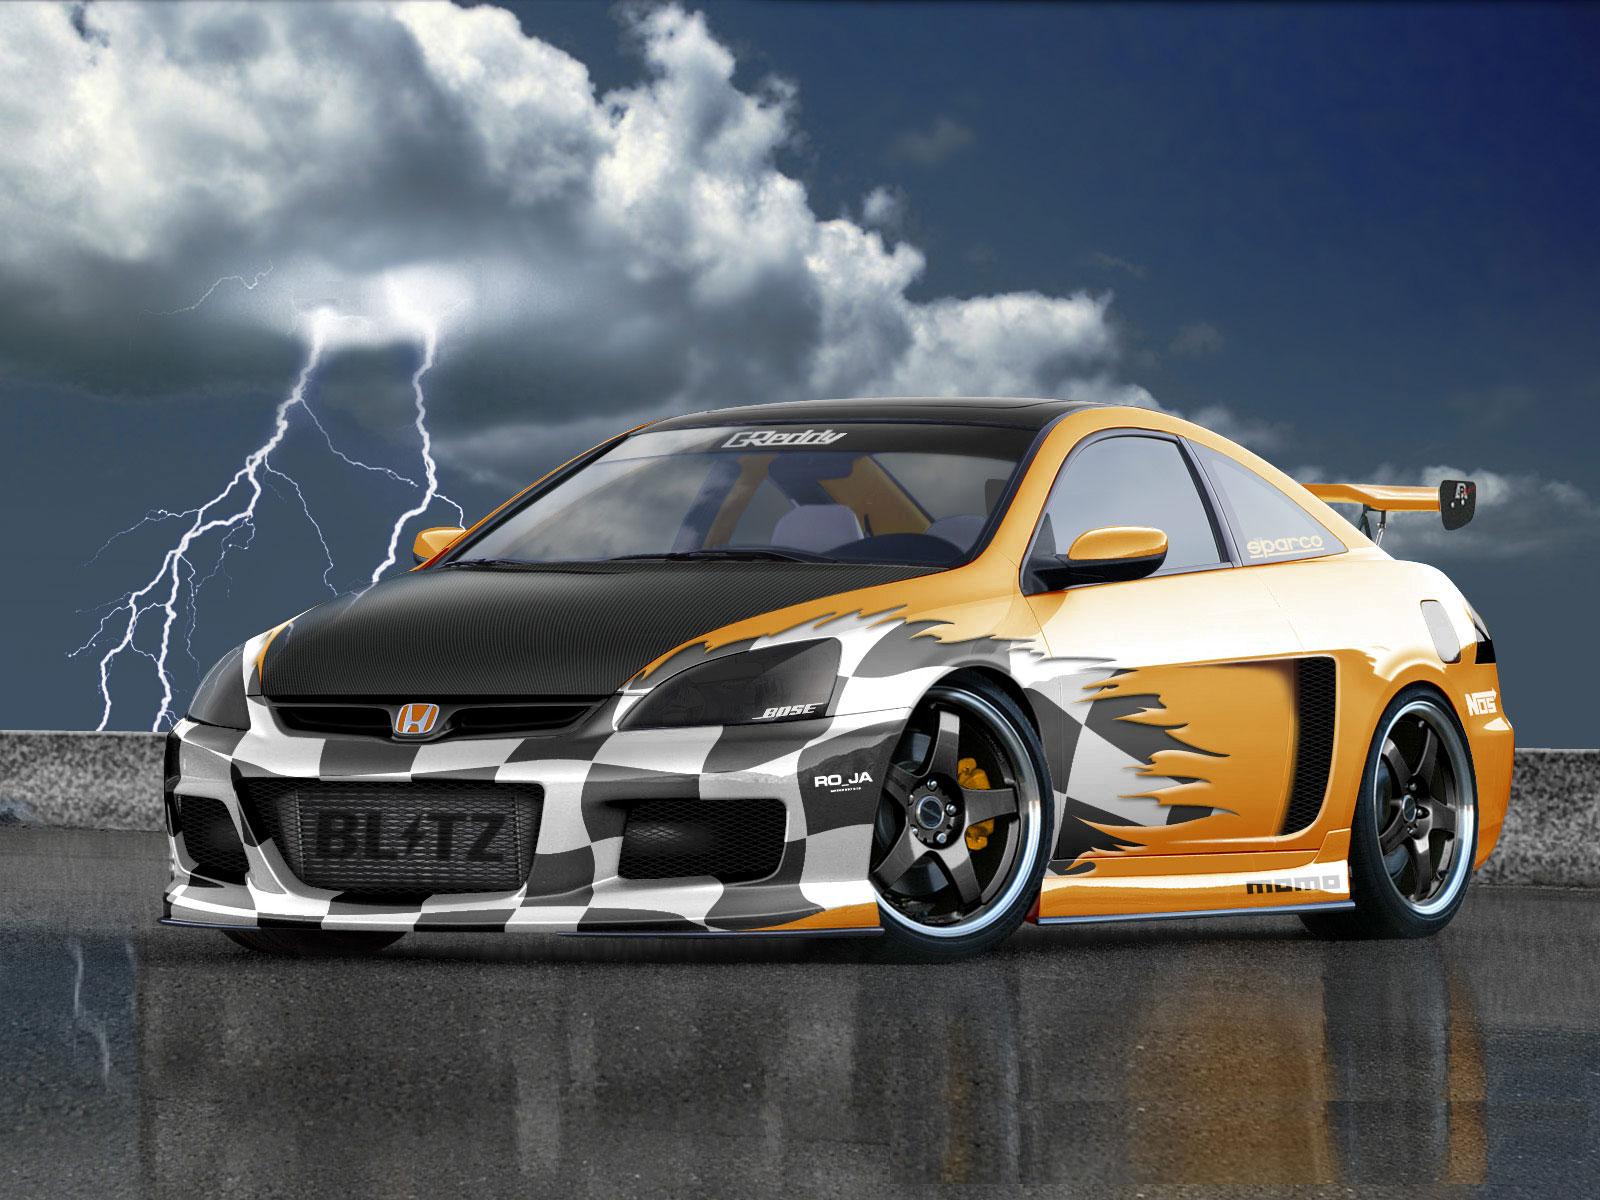 cool sports car %2b2